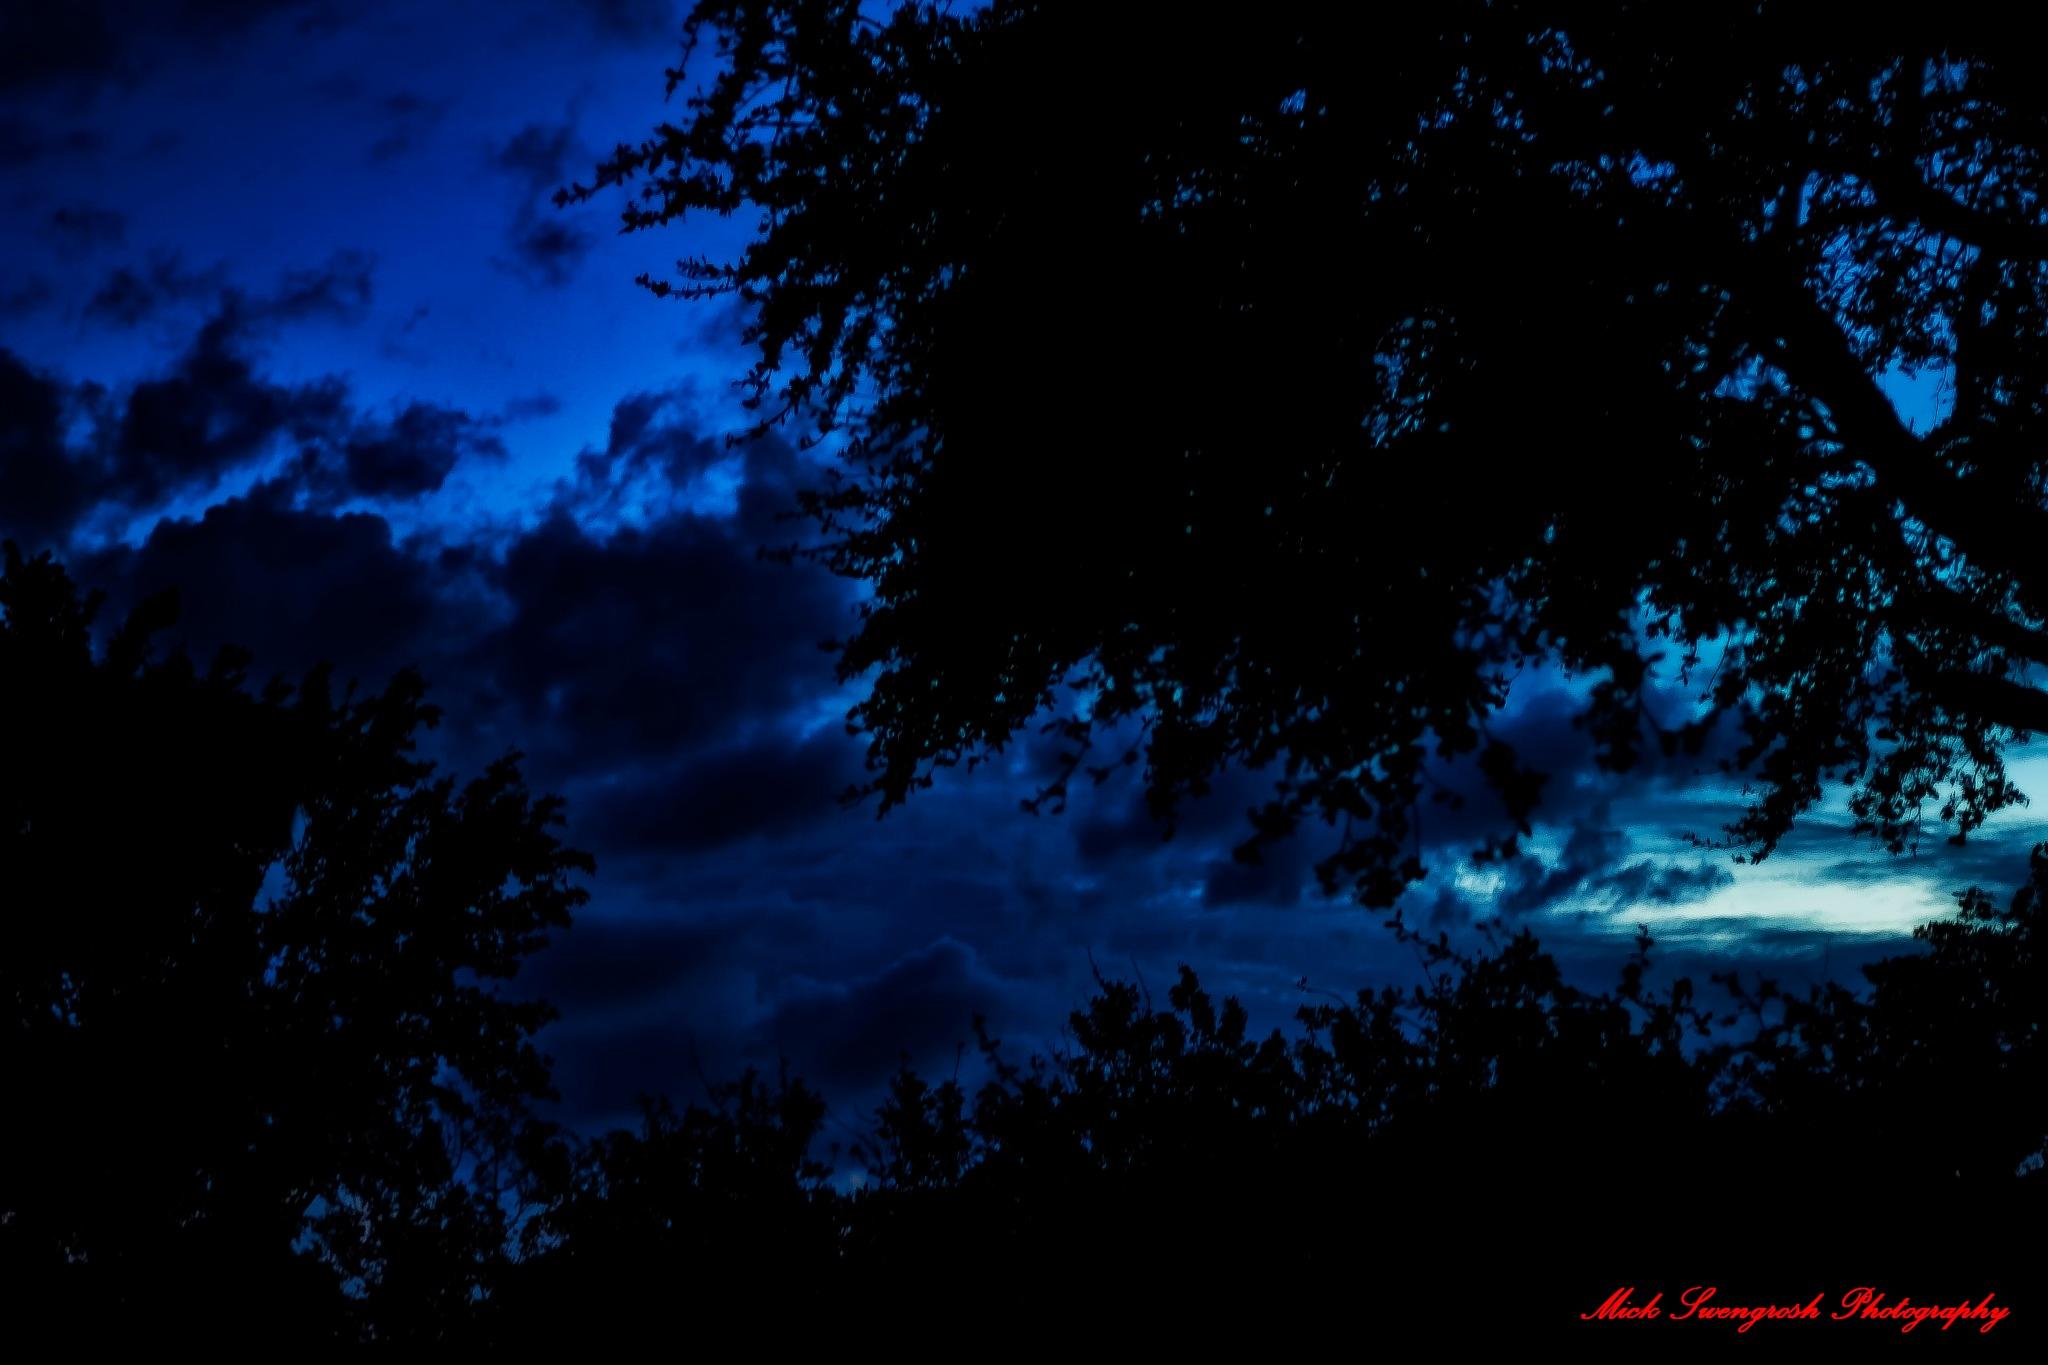 Last evenings Florida Sky by Mick Swengrosh